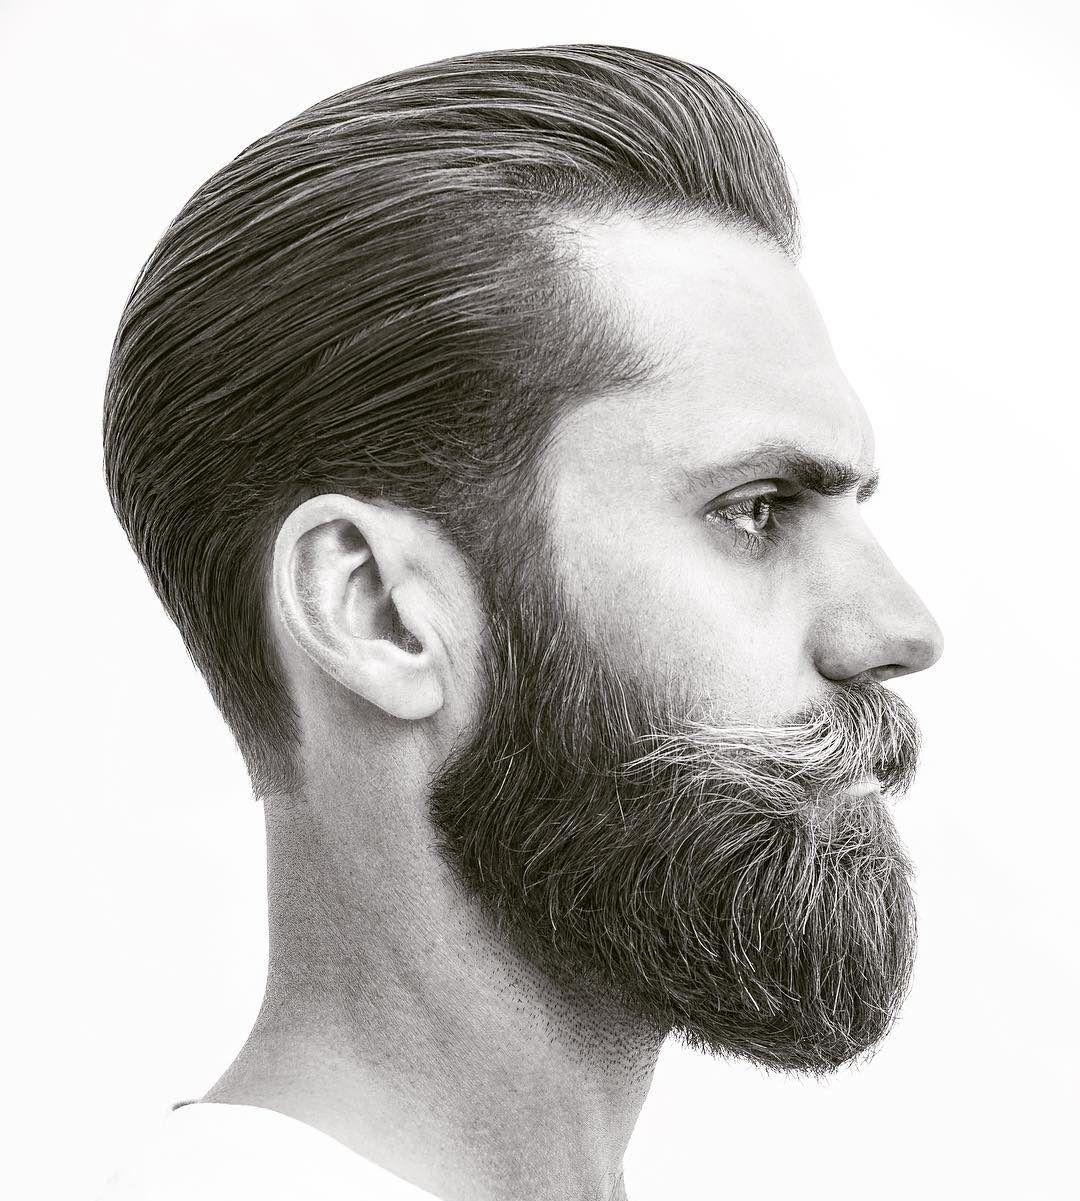 22 Hipster Haircuts For Men Super Cool Fun Styles For 2020 Hipster Hairstyles Hipster Haircuts For Men Hipster Haircut